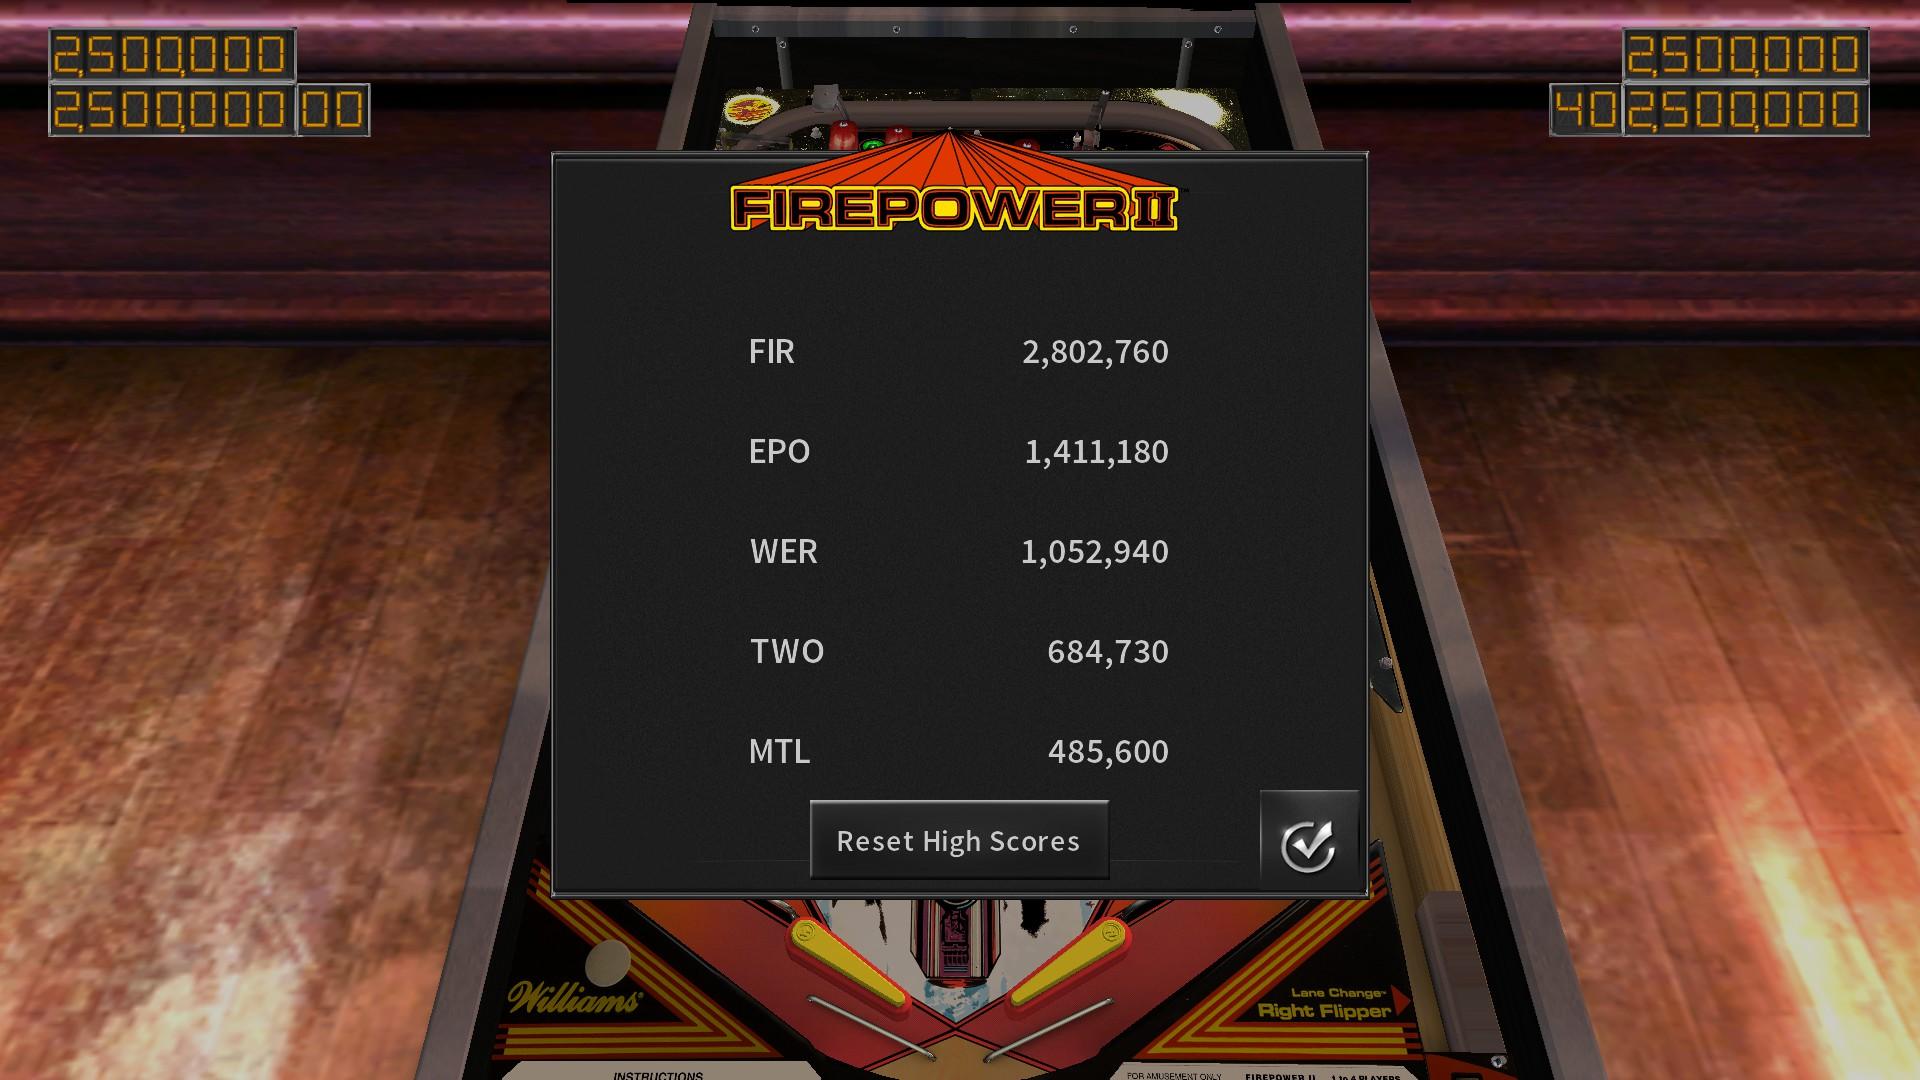 Mantalow: Pinball Arcade: Firepower II (PC) 485,600 points on 2017-07-24 12:48:21